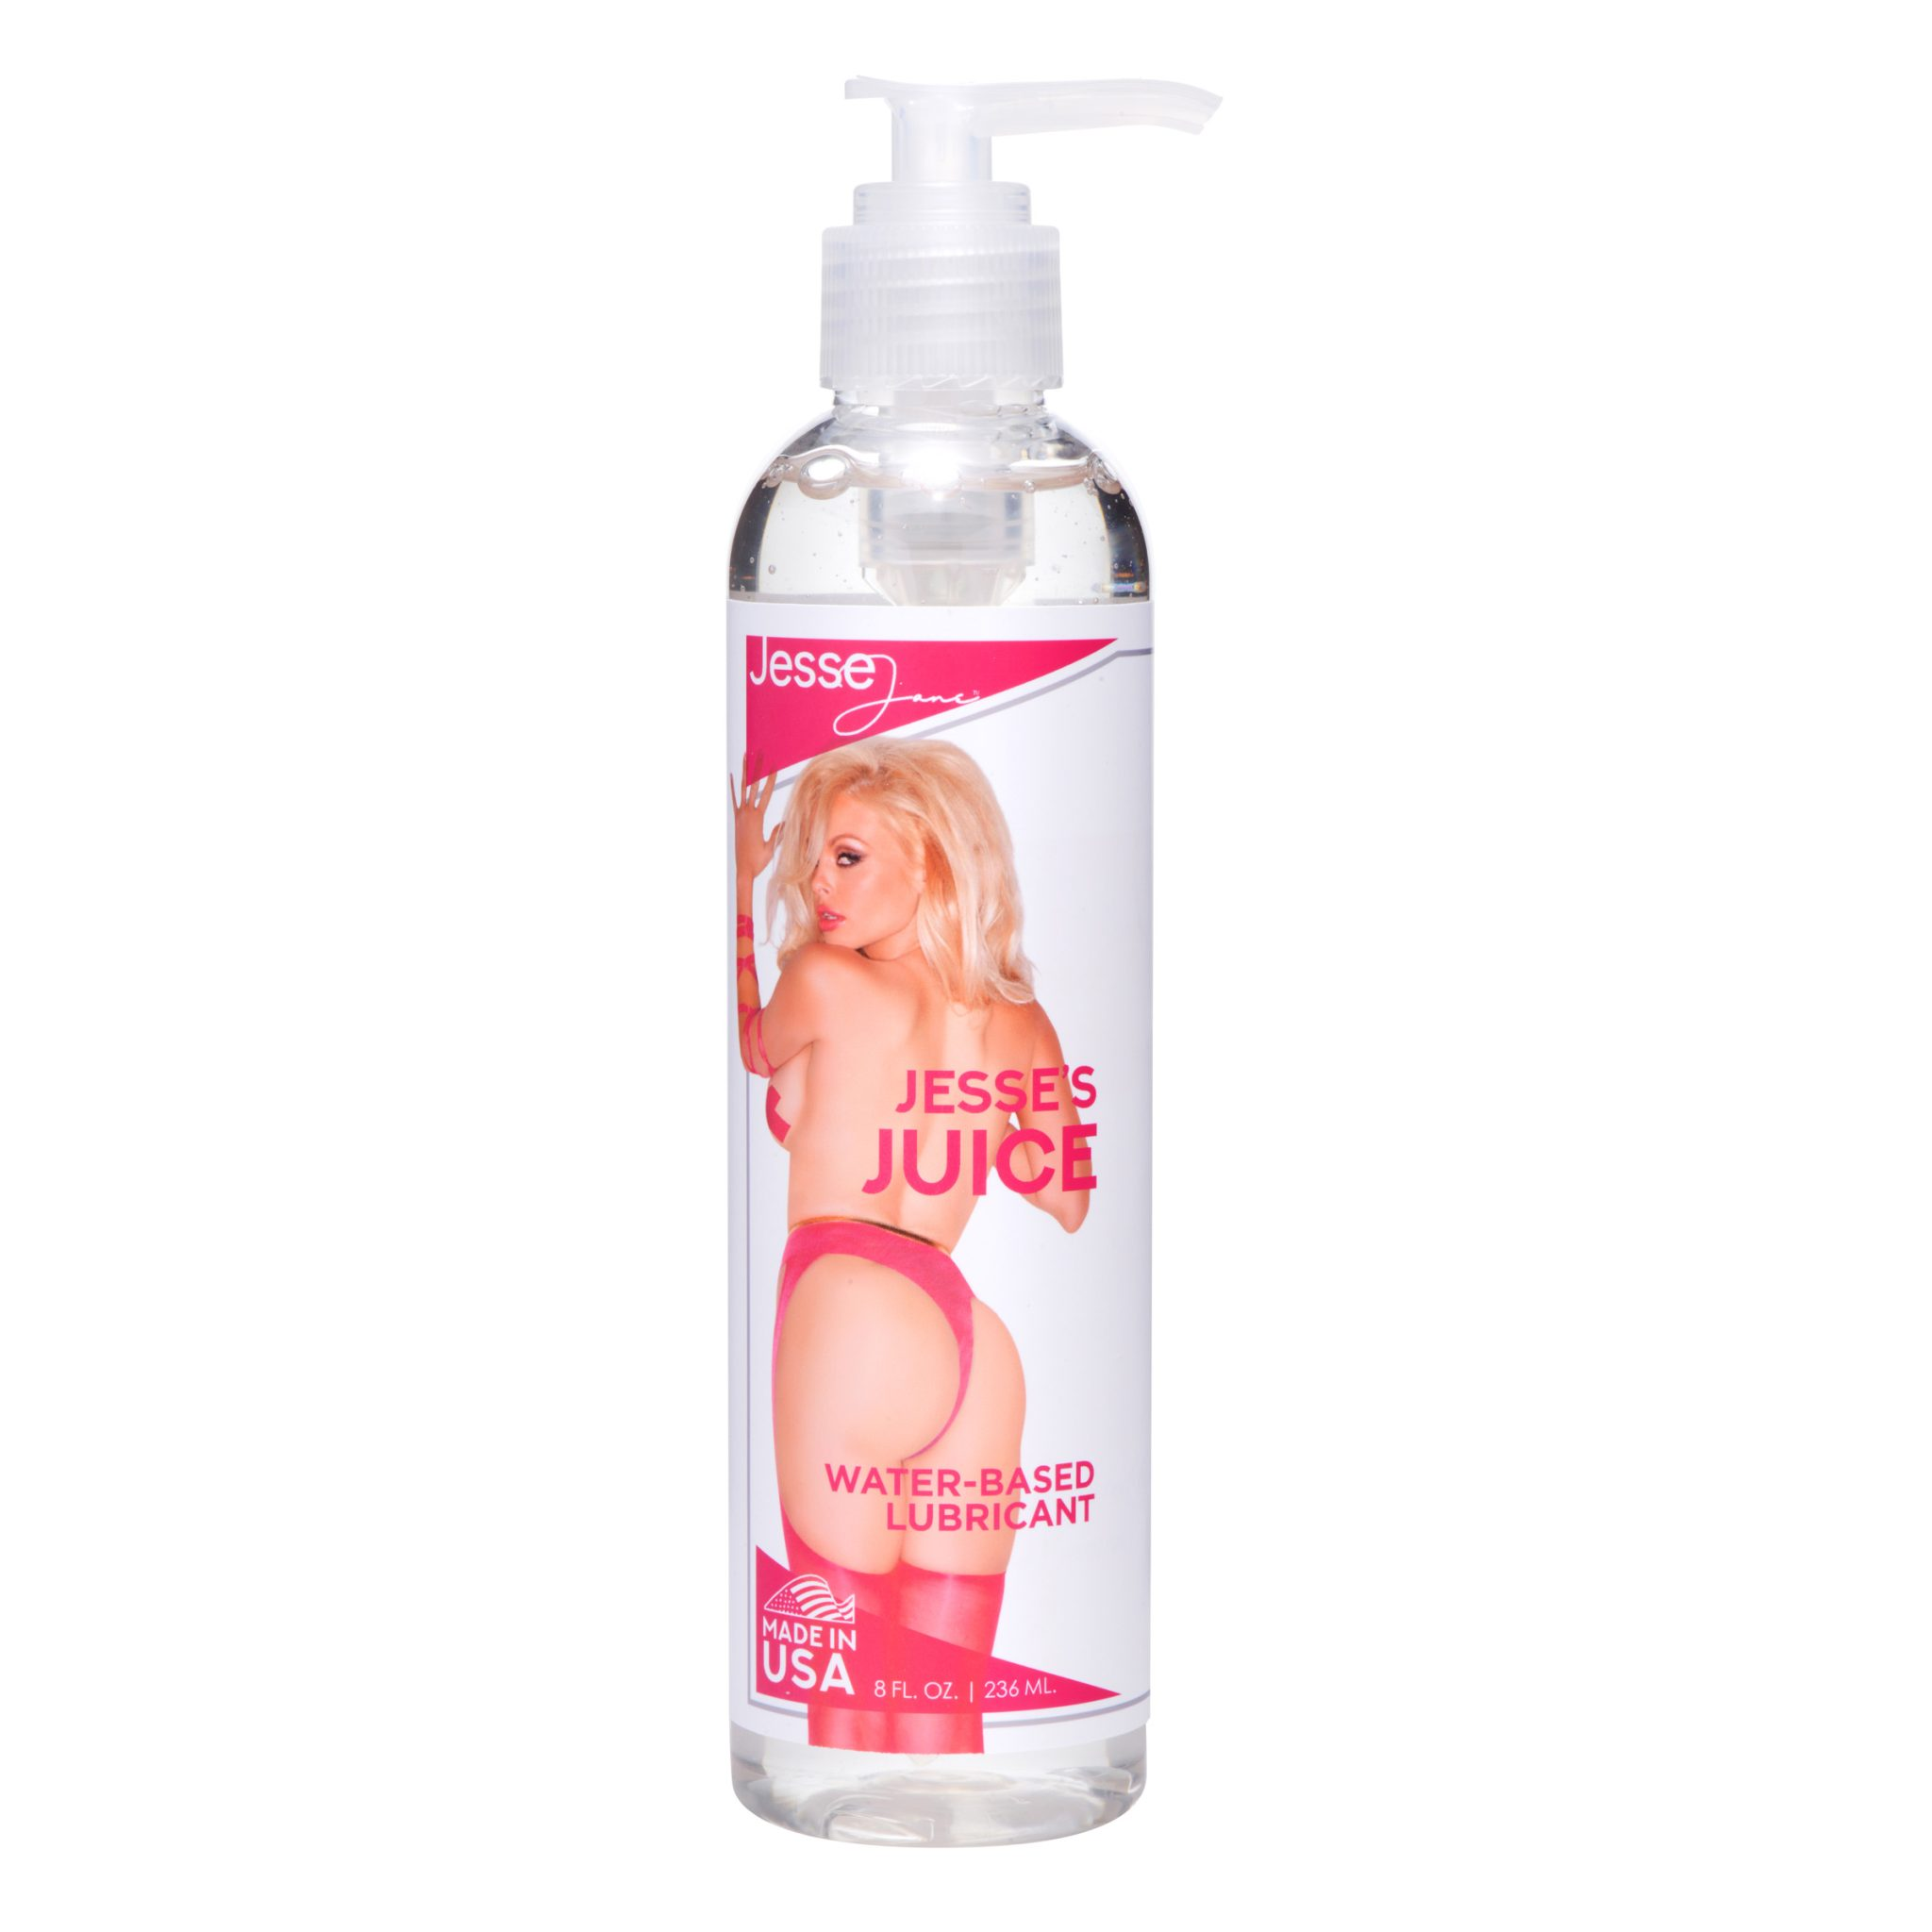 Jesses Juice Water-Based Lubricant- 8 oz